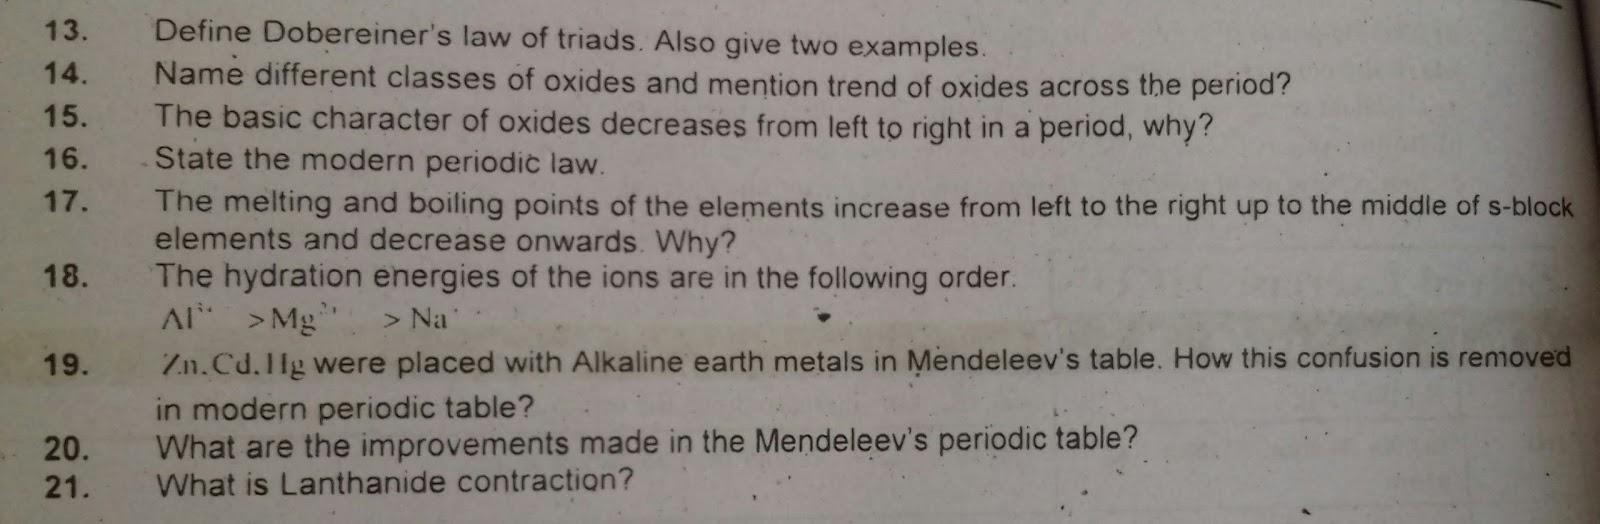 FSc part 2 chemistry chapter 1 important questions - Ratta pk